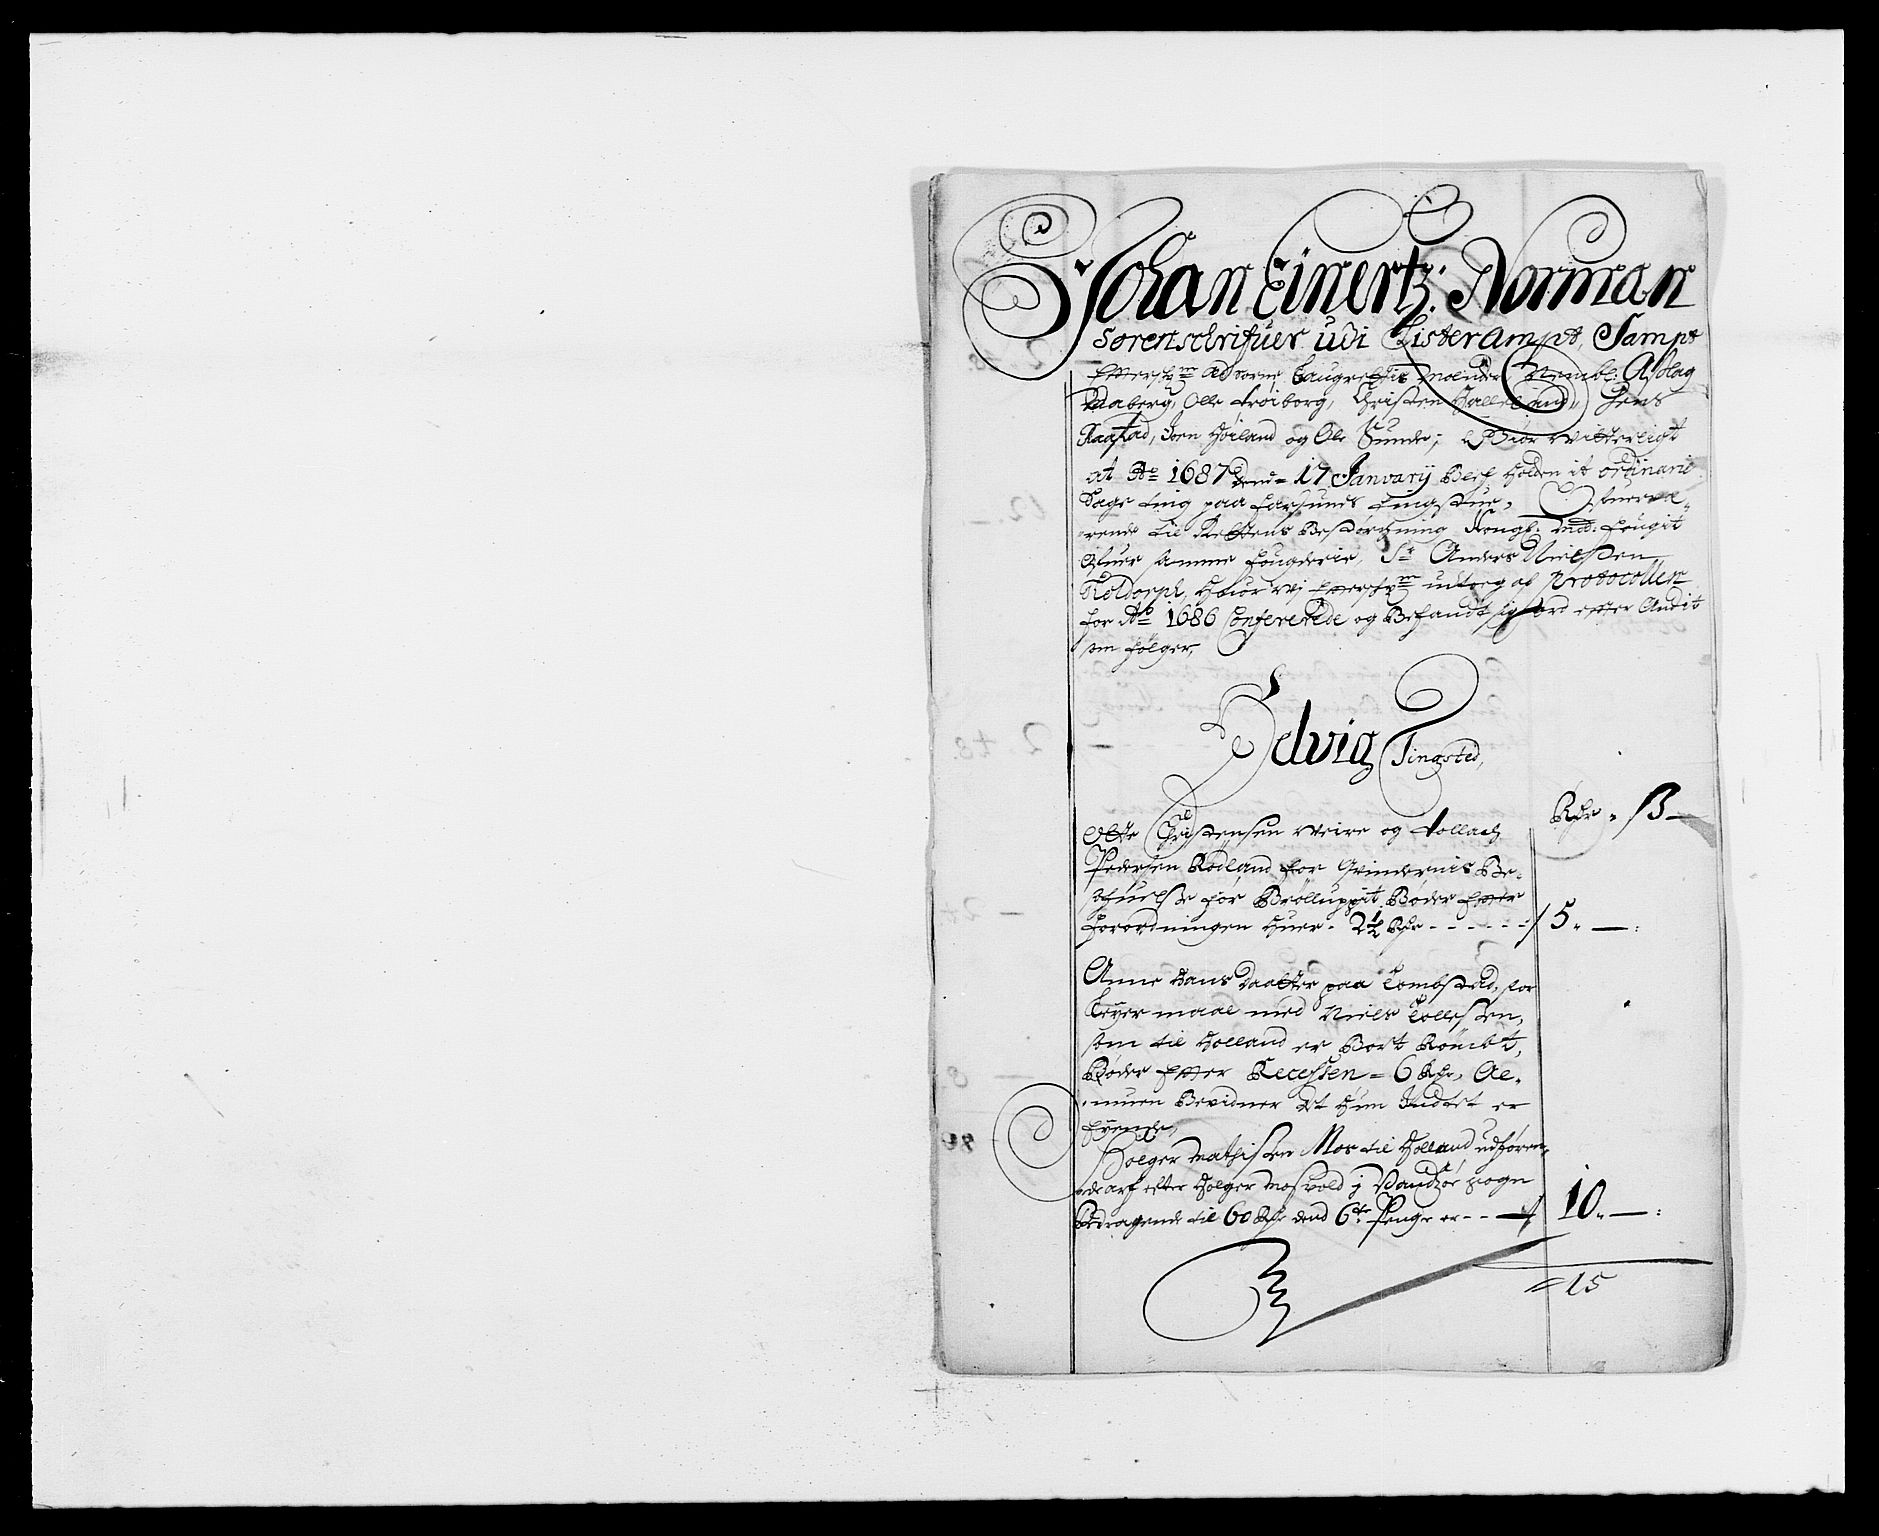 RA, Rentekammeret inntil 1814, Reviderte regnskaper, Fogderegnskap, R41/L2534: Fogderegnskap Lista, 1686-1688, s. 49